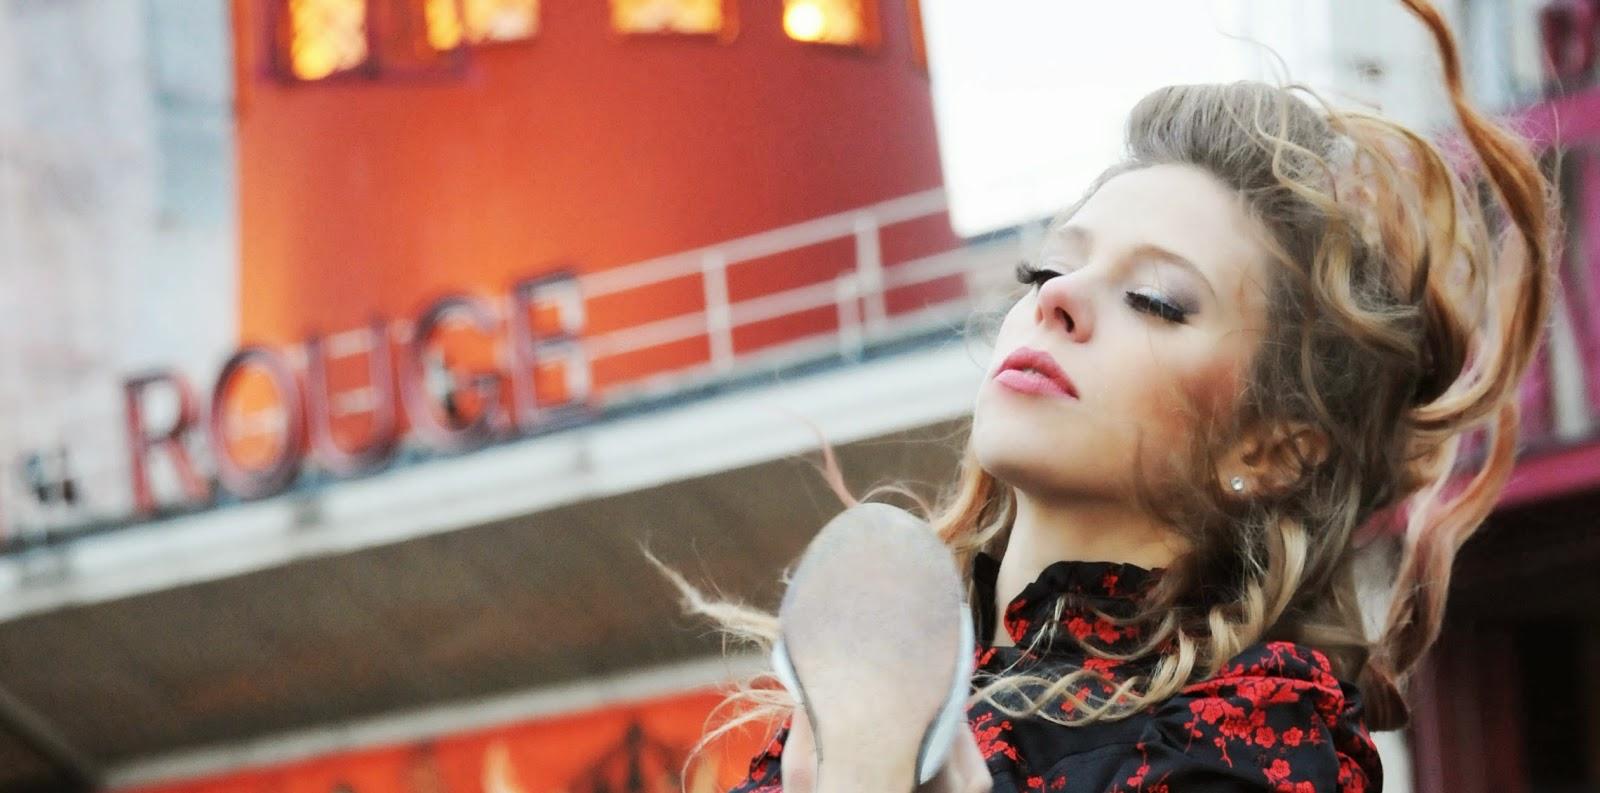 http://www.danseuse-choregraphe.com/